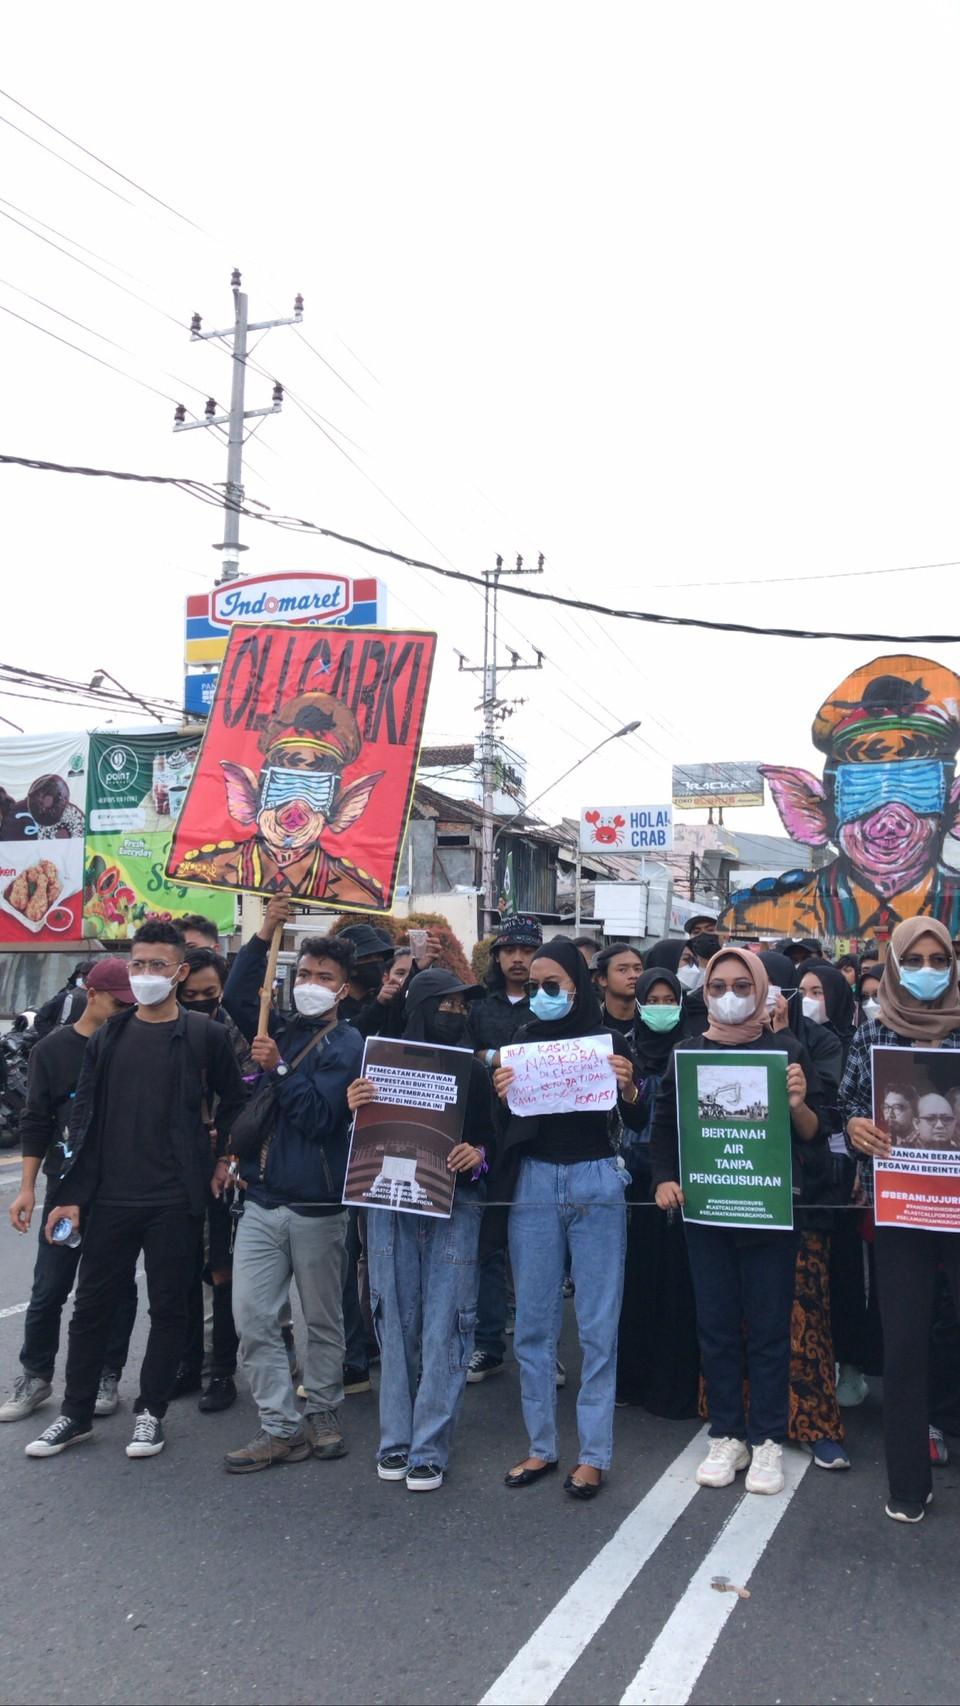 Aksi 'Selamatkan Warga Yogyakarta' : Sebuah Panggilan Terakhir untuk  Menagih  Kehadiran Presiden Jokowi?